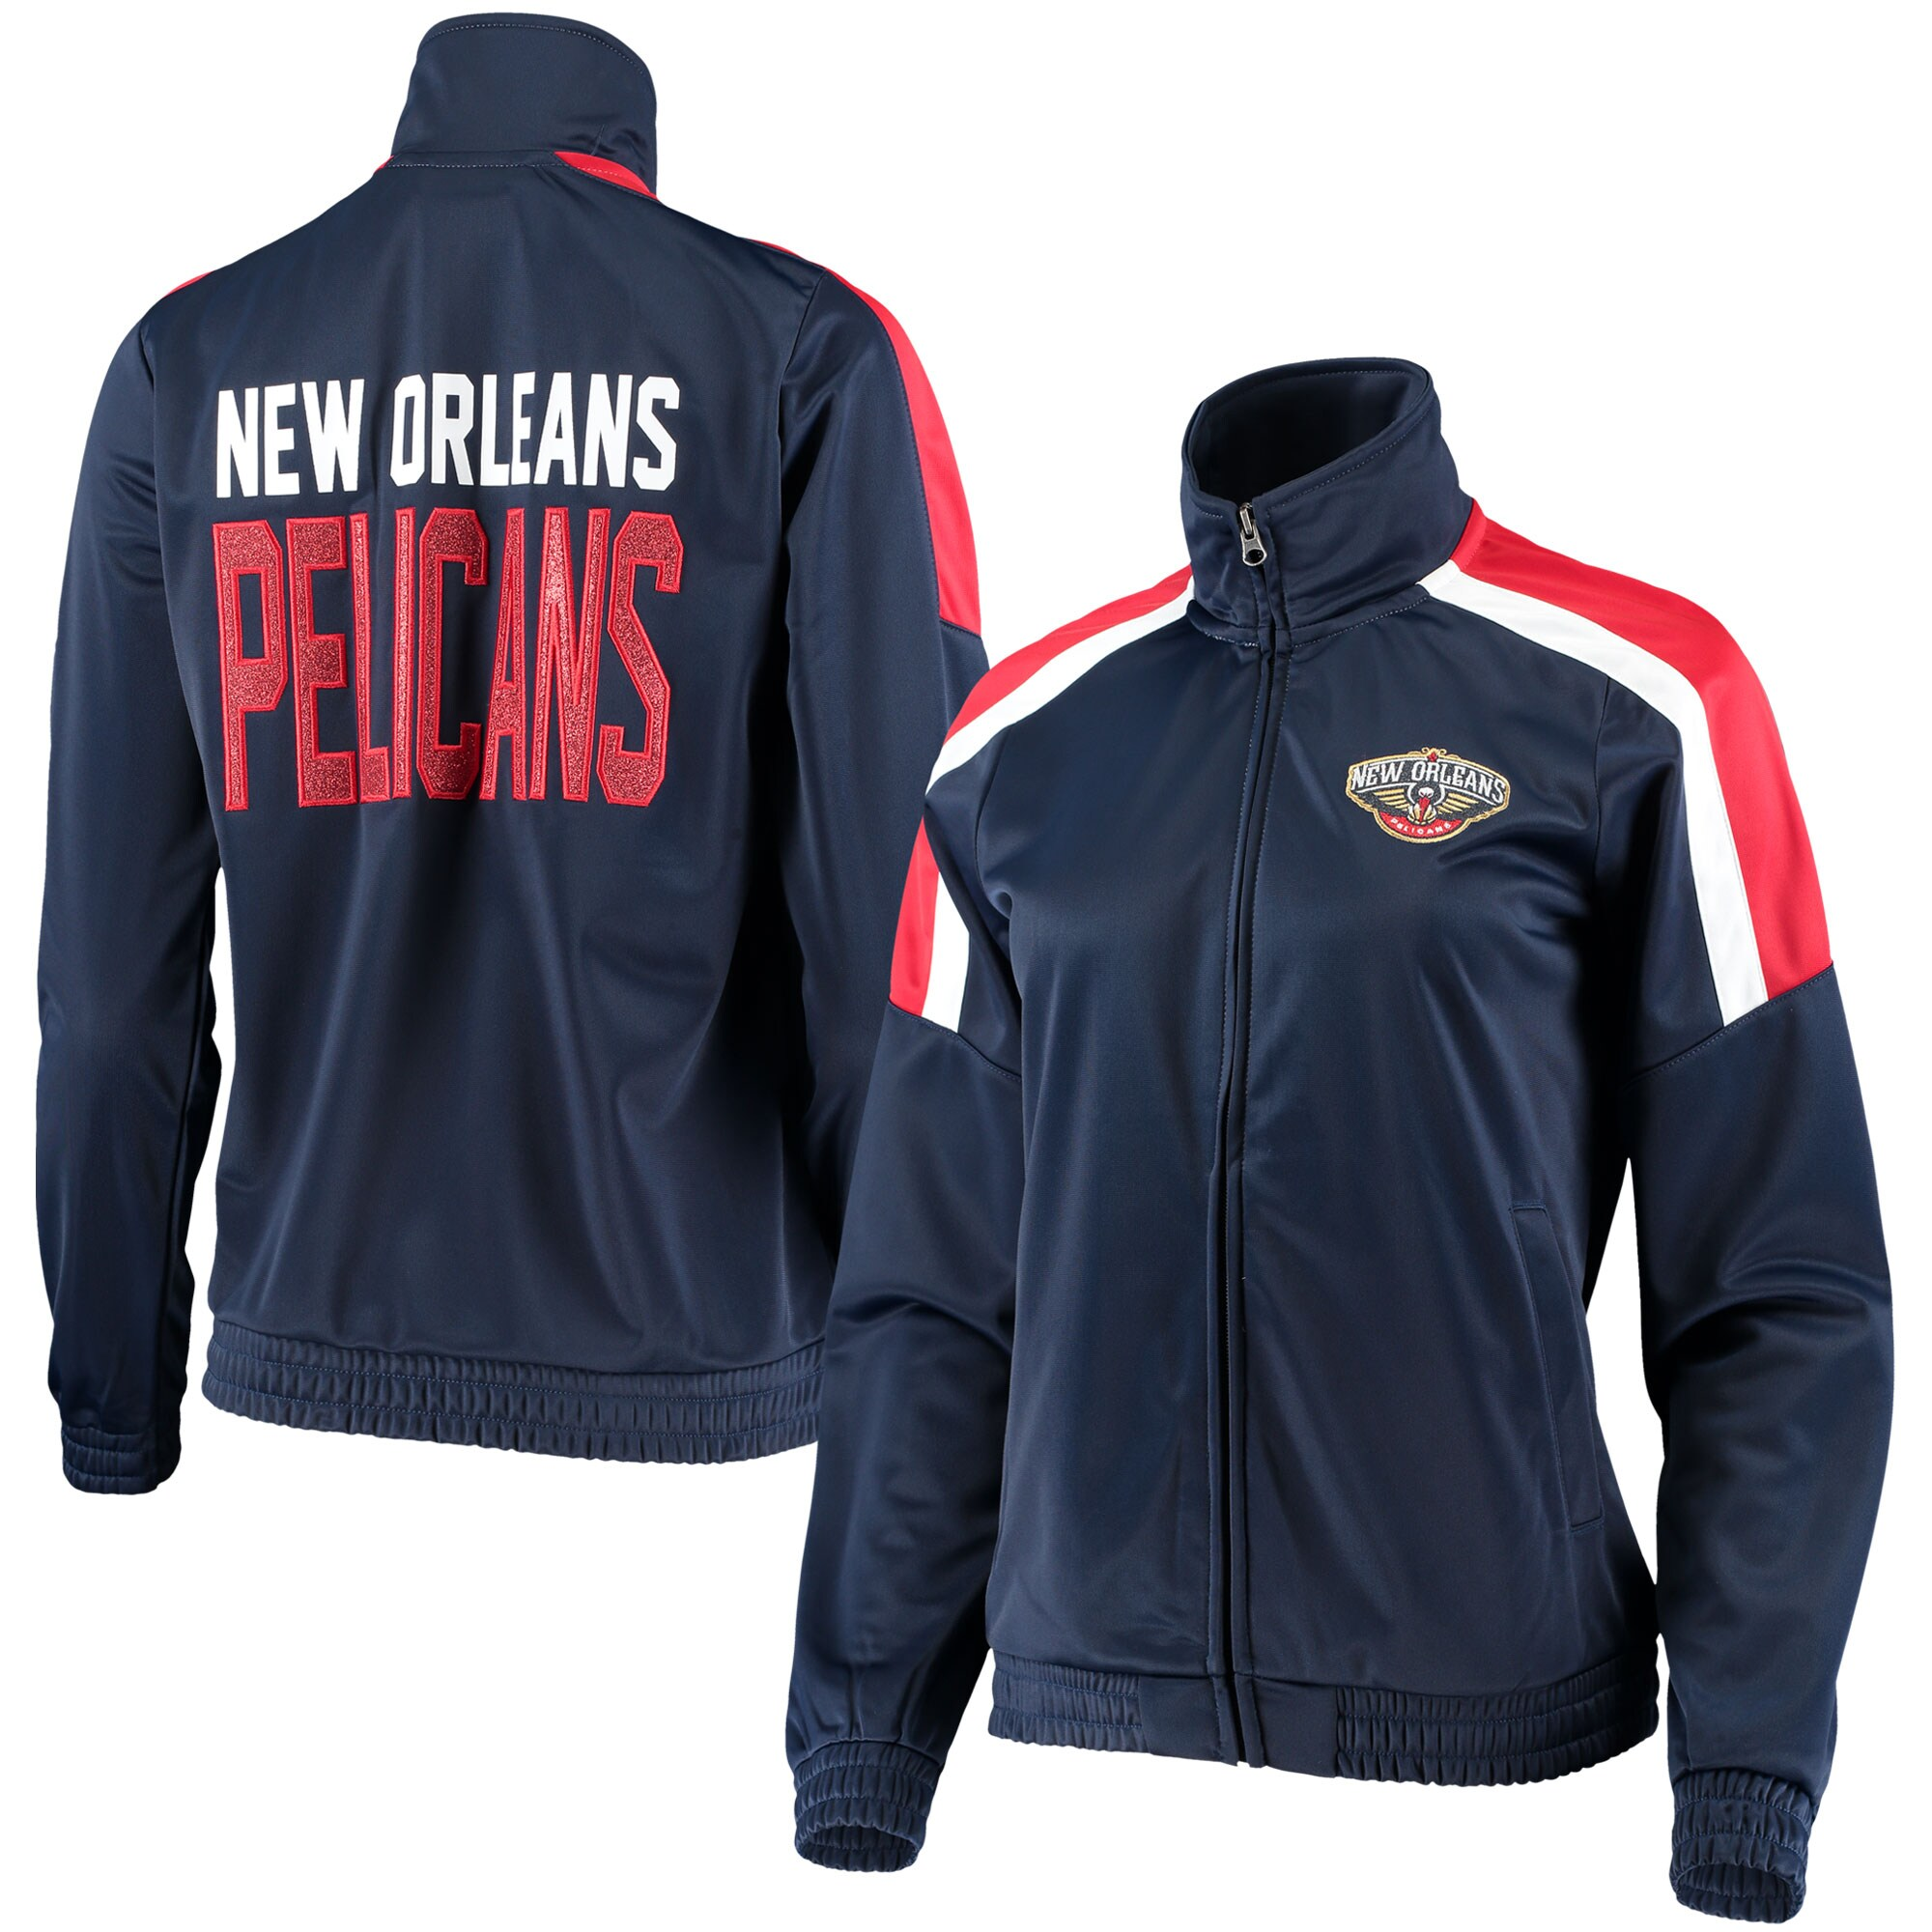 New Orleans Pelicans G-III 4Her by Carl Banks Women's Jump Shot Full-Zip Track Jacket - Navy